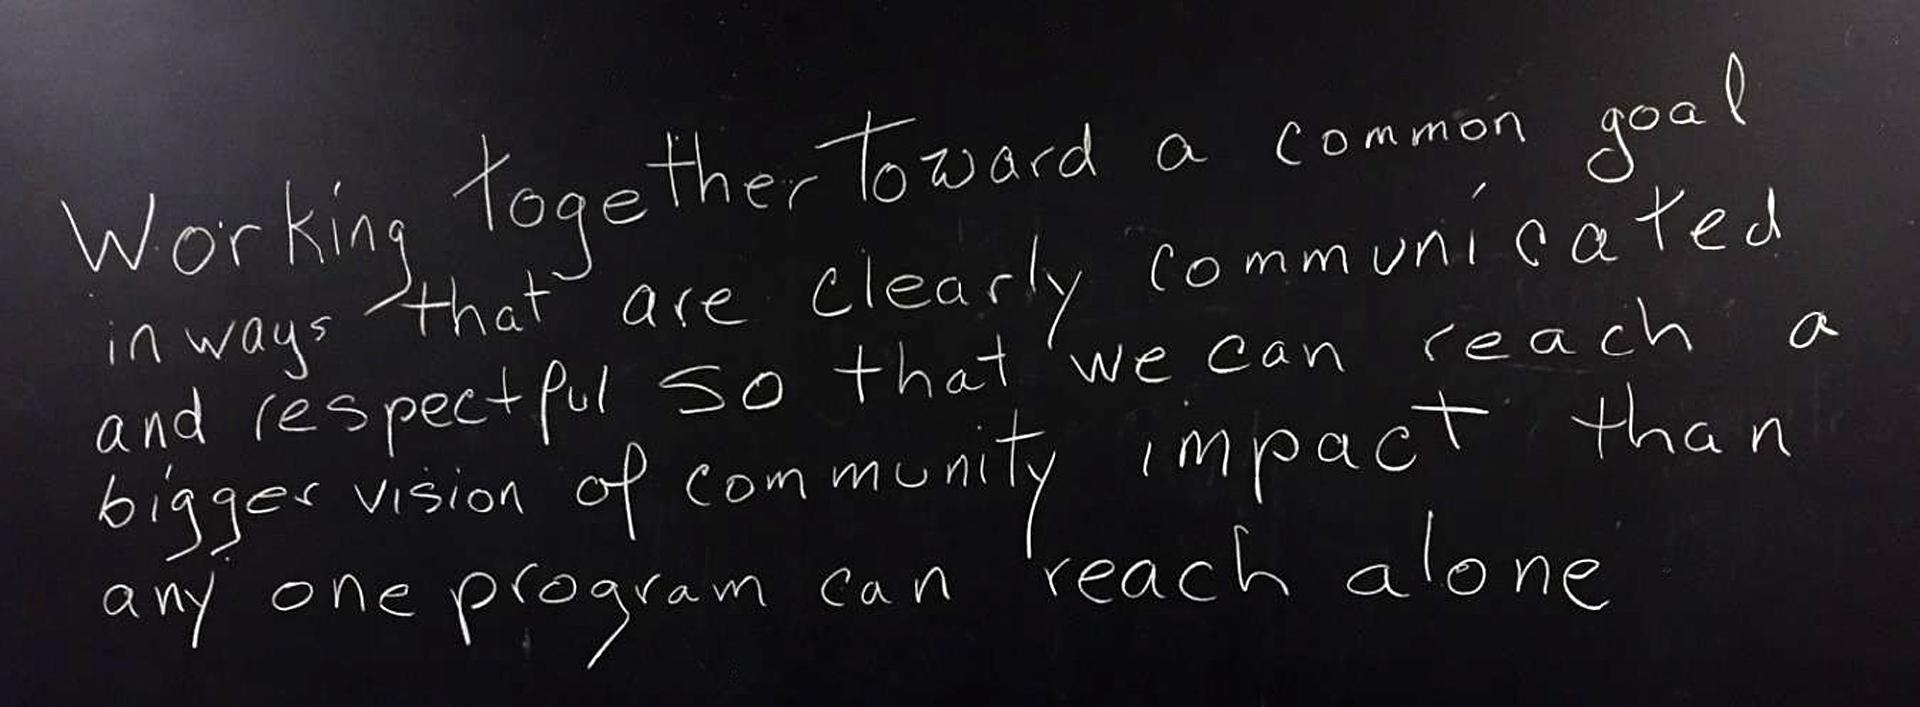 Positive community impact message